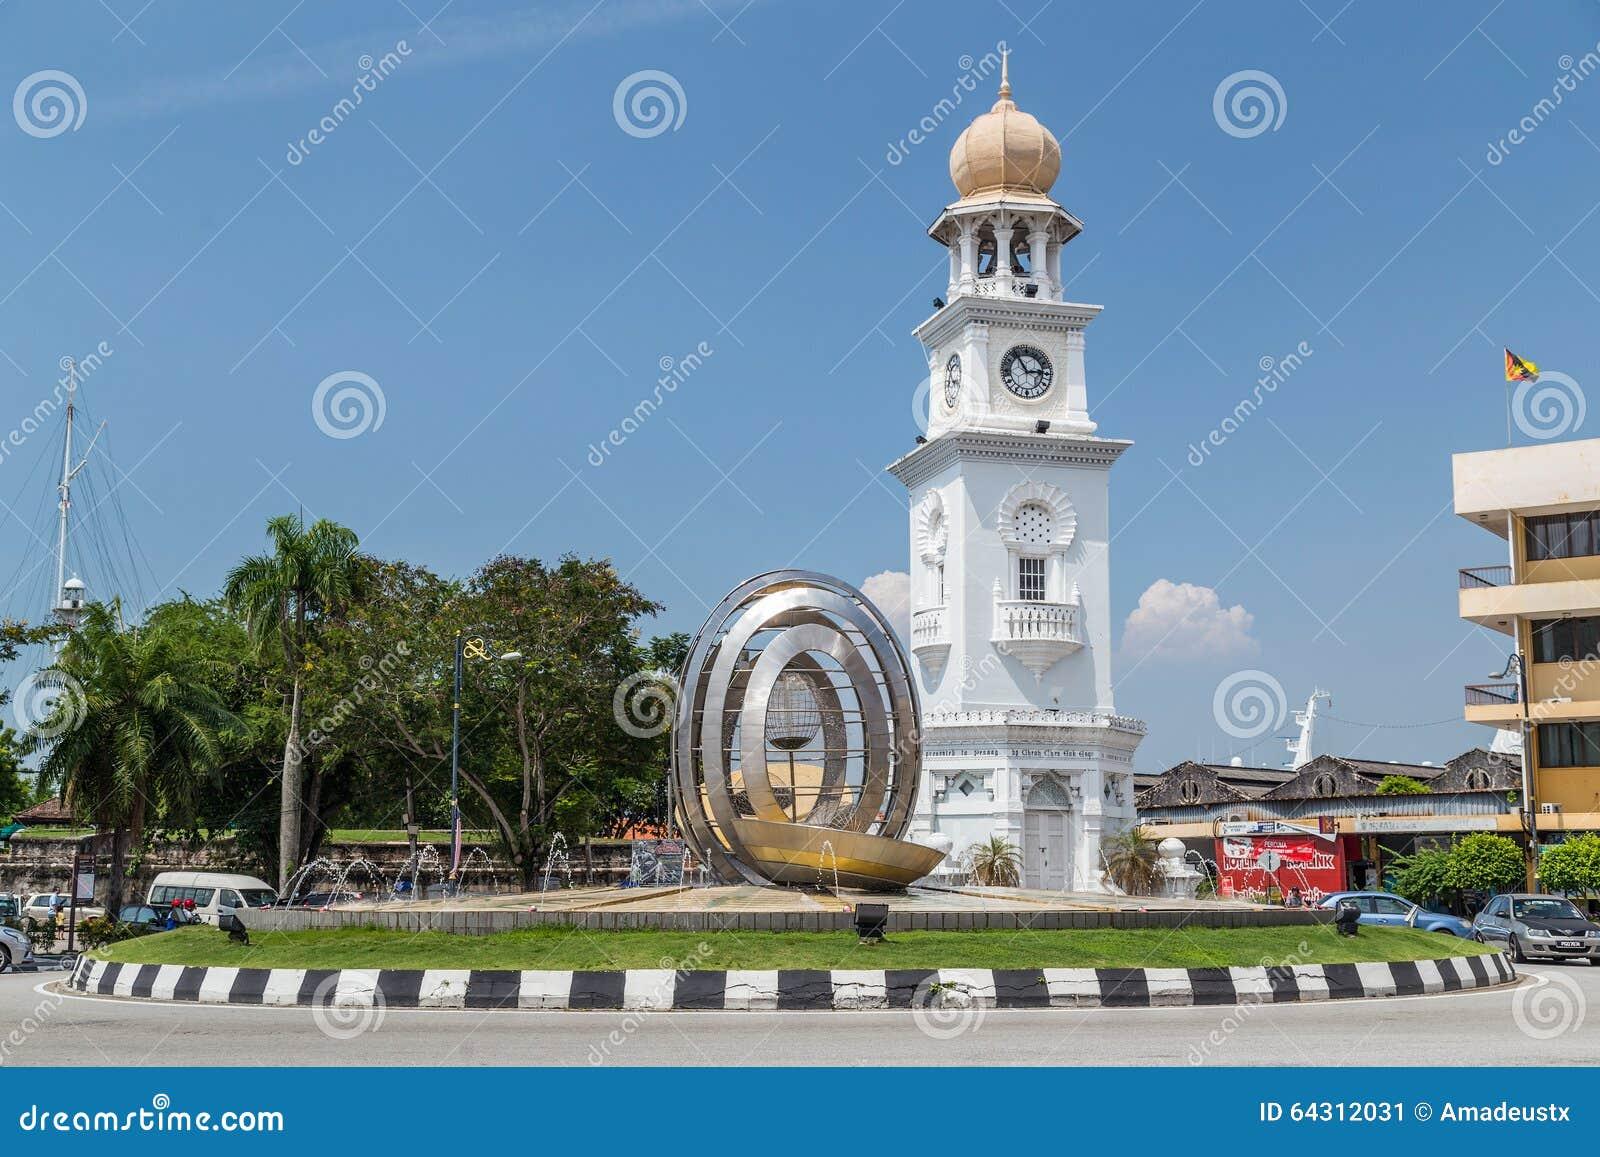 Georgetown, Penang/Malasia - circa octubre de 2015: Reina Victoria Memorial Clocktower en Georgetown, Penang, Malasia